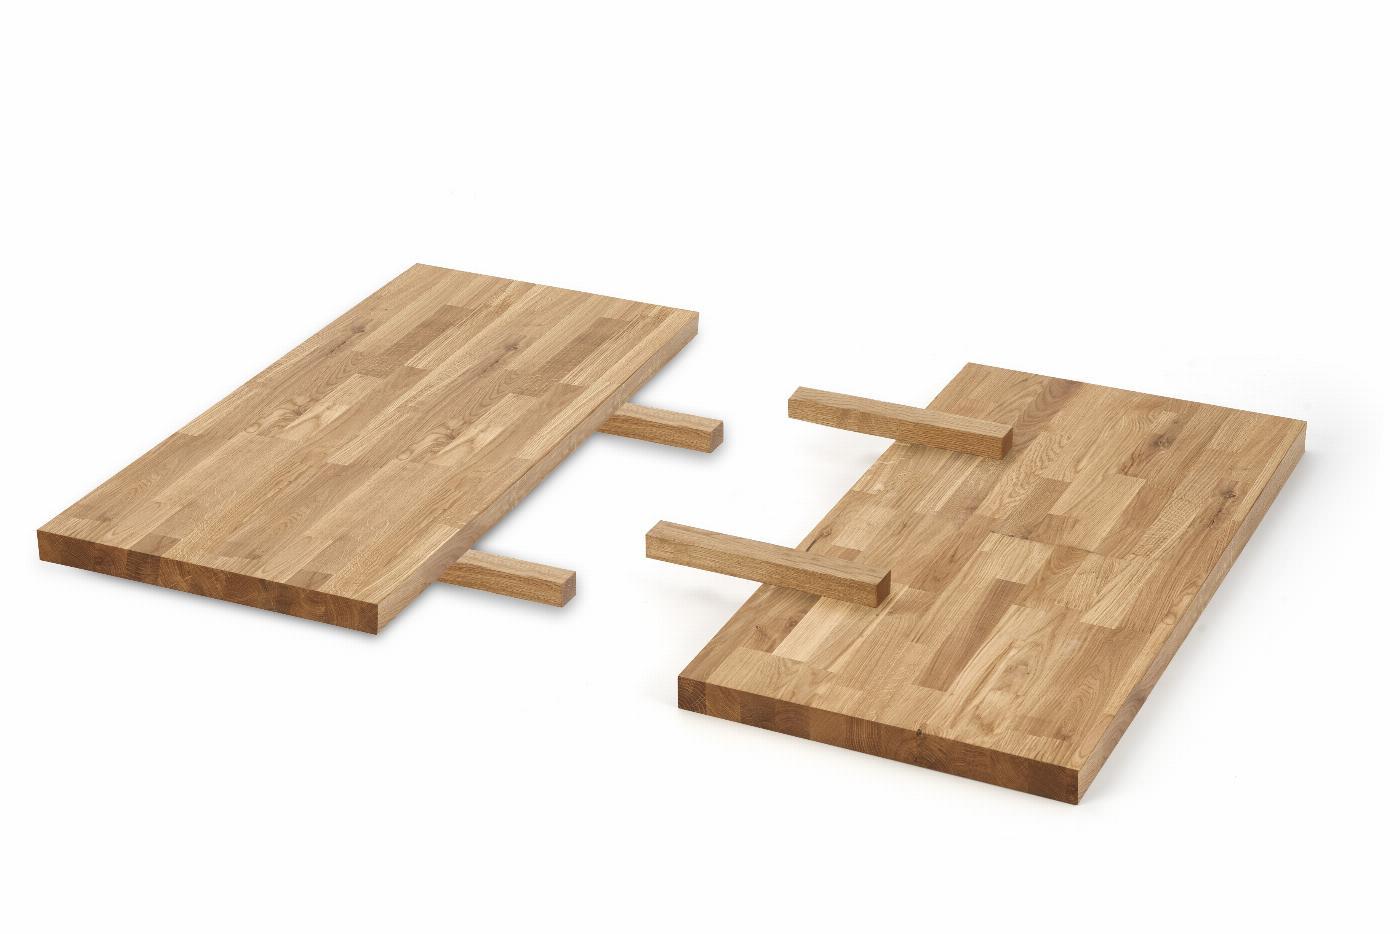 APEX & RADUS - przedłużka blatu 90x45 cm; drewno lite - dębowe kolor: dąb naturalny (1p=1szt)